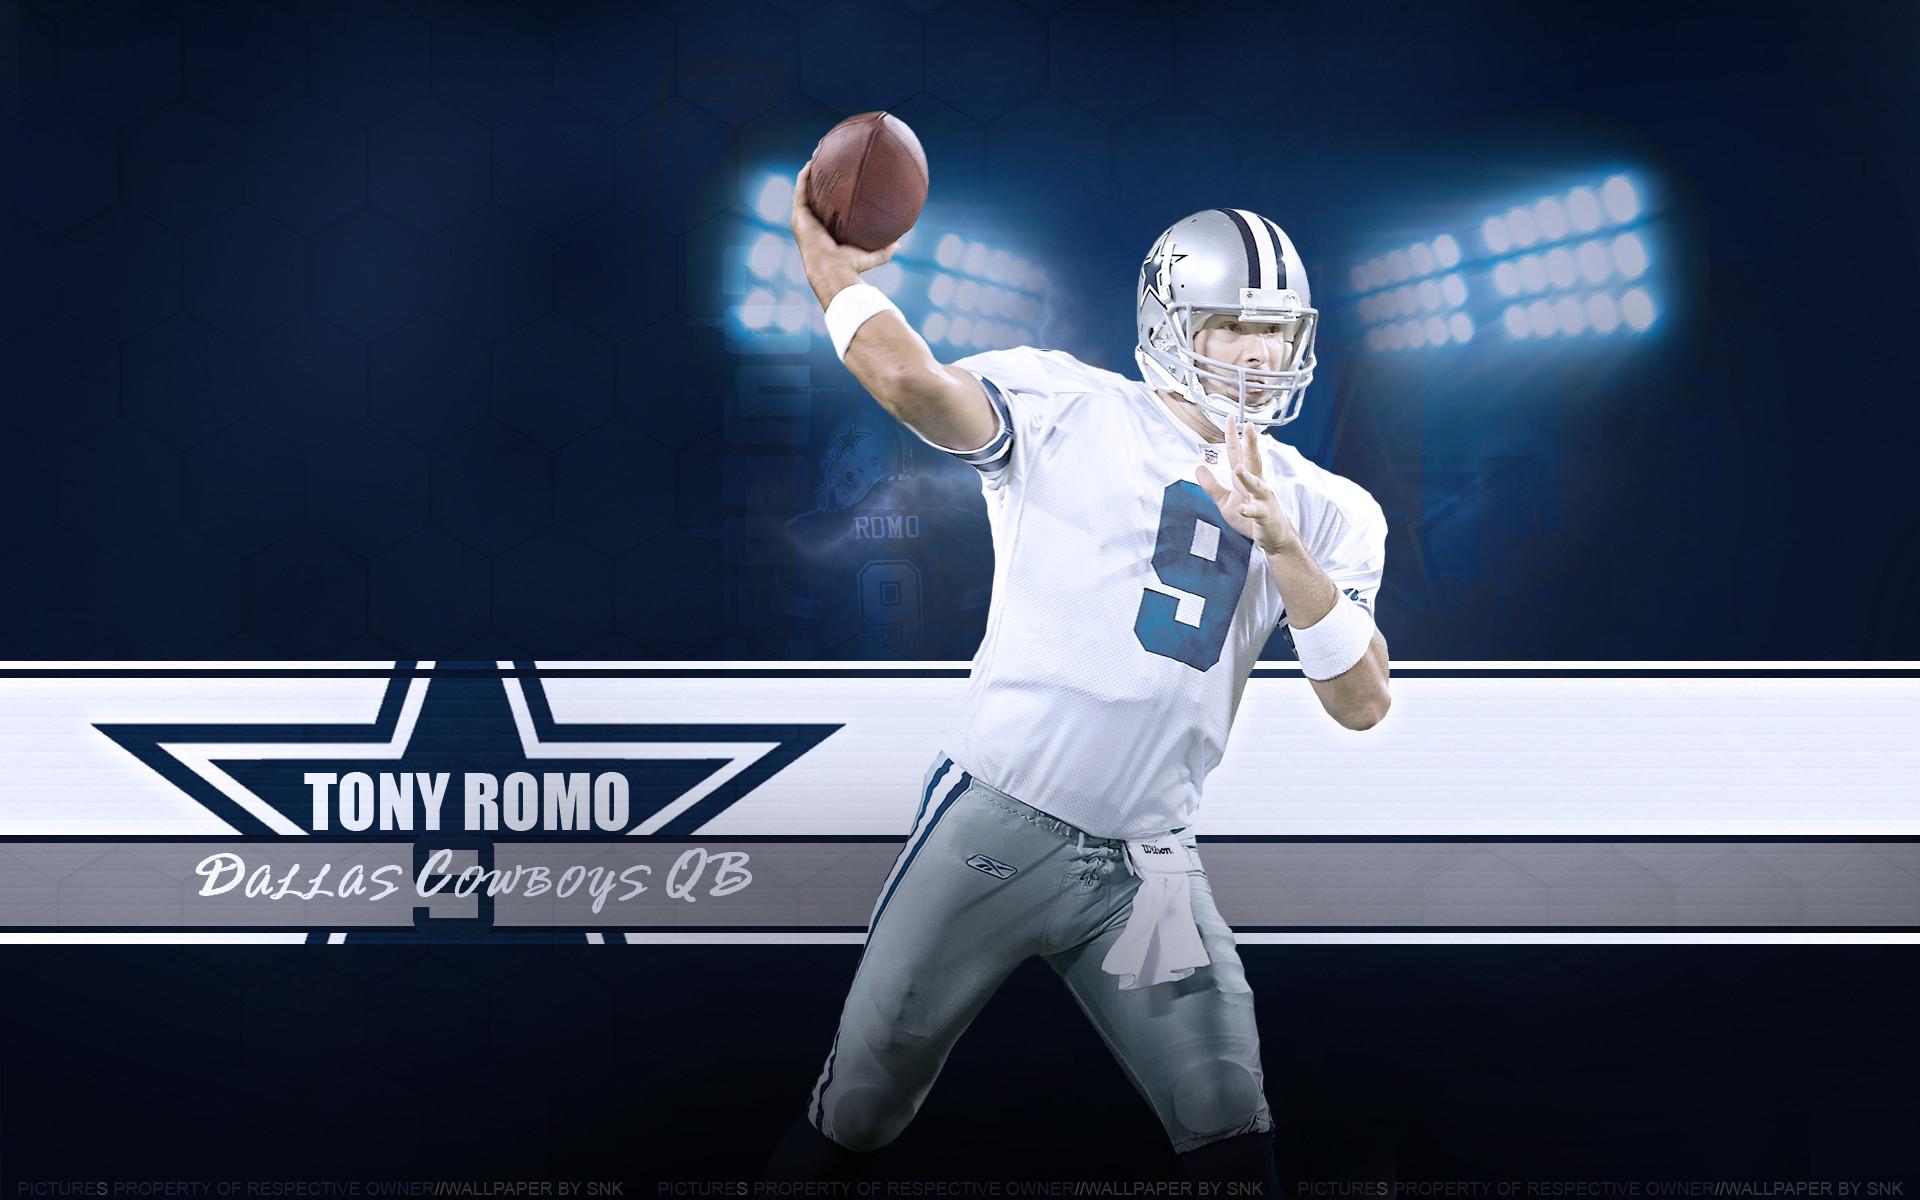 4k Ultra Dallas Cowboys Tony Romo Hq Definition Wallpapers - Dallas Cowboys Tony Romo - HD Wallpaper